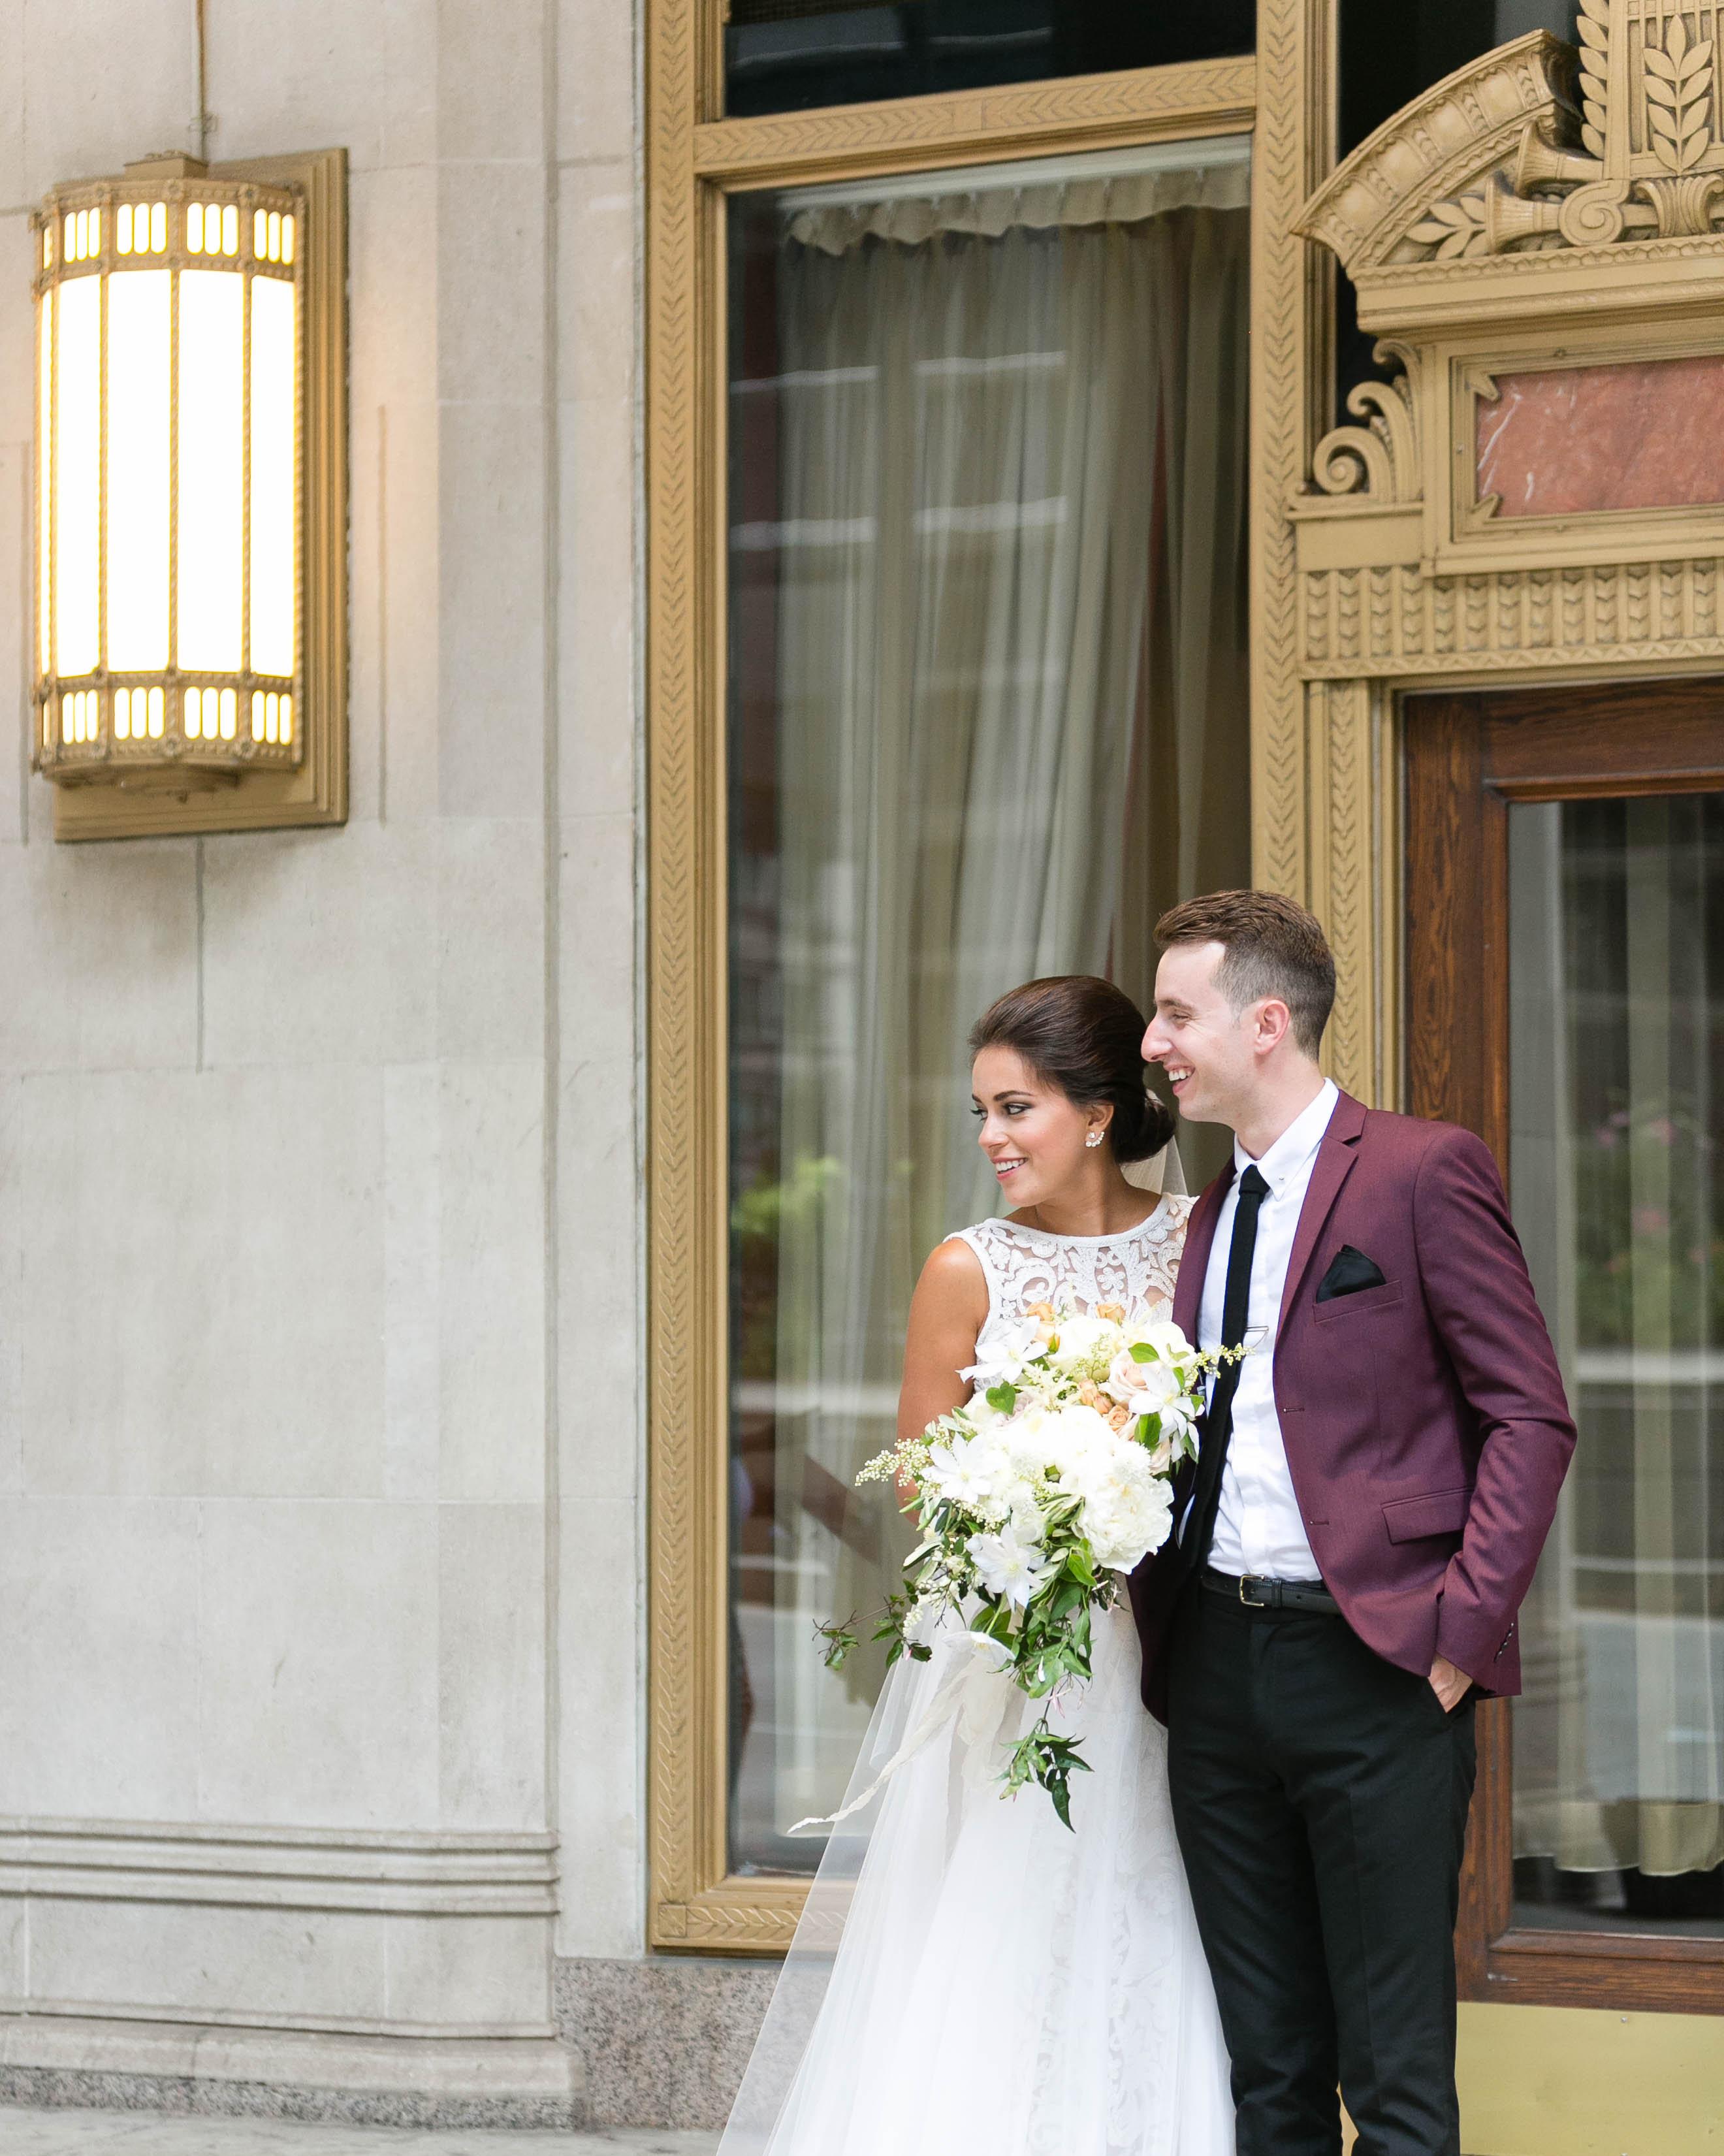 bianca-bryen-wedding-couple-117-s112509-0216.jpg